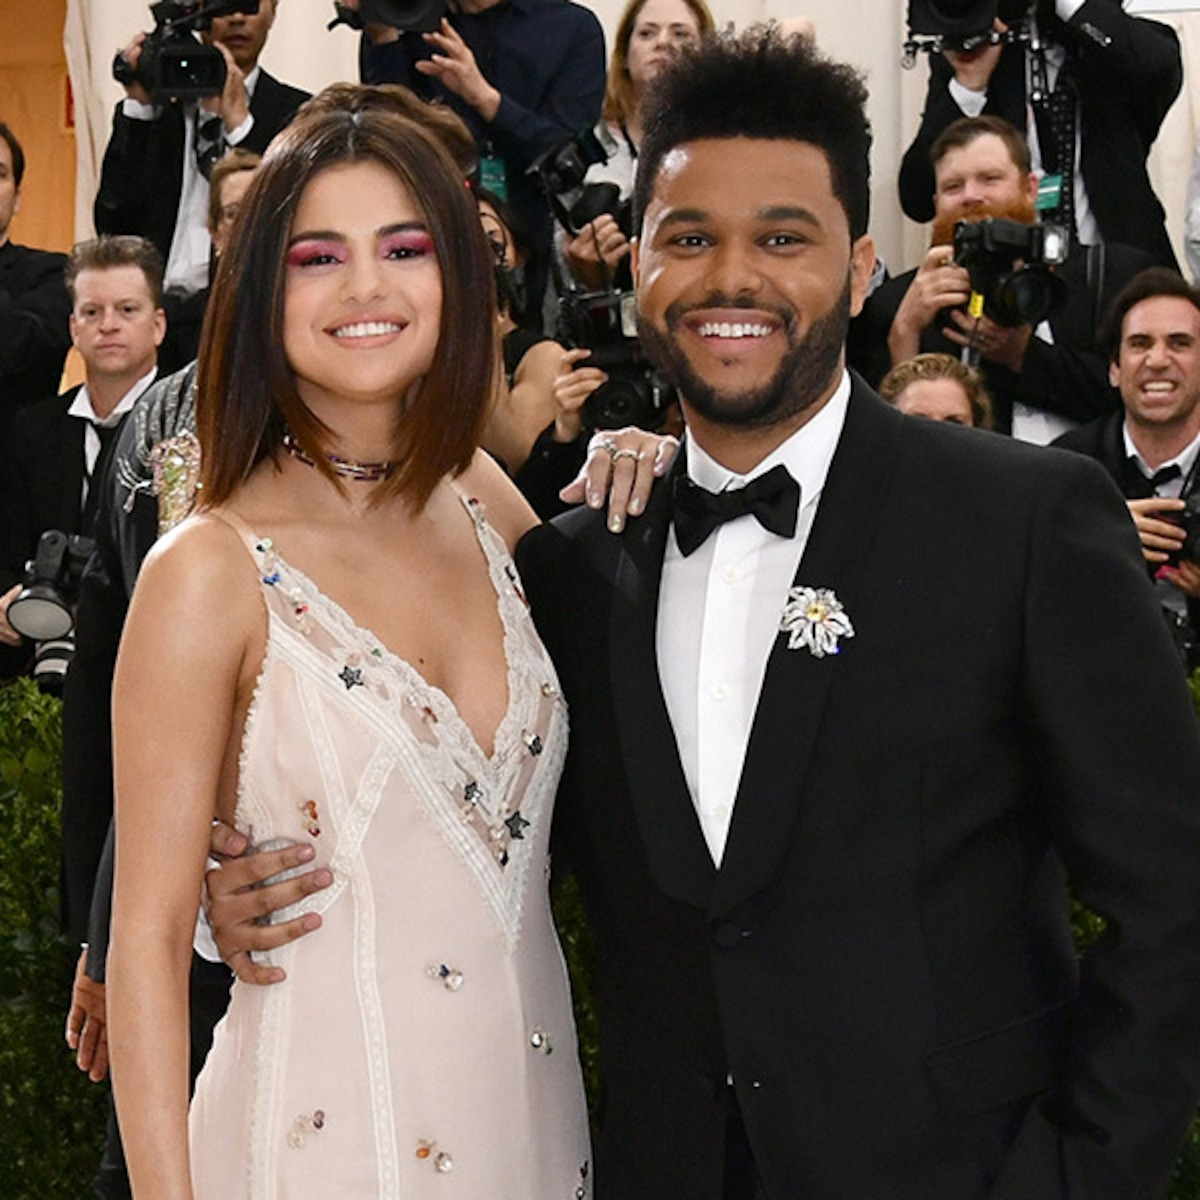 Selena Gomez e The Weeknd terminam o namoro após 10 meses - E! Online Brasil